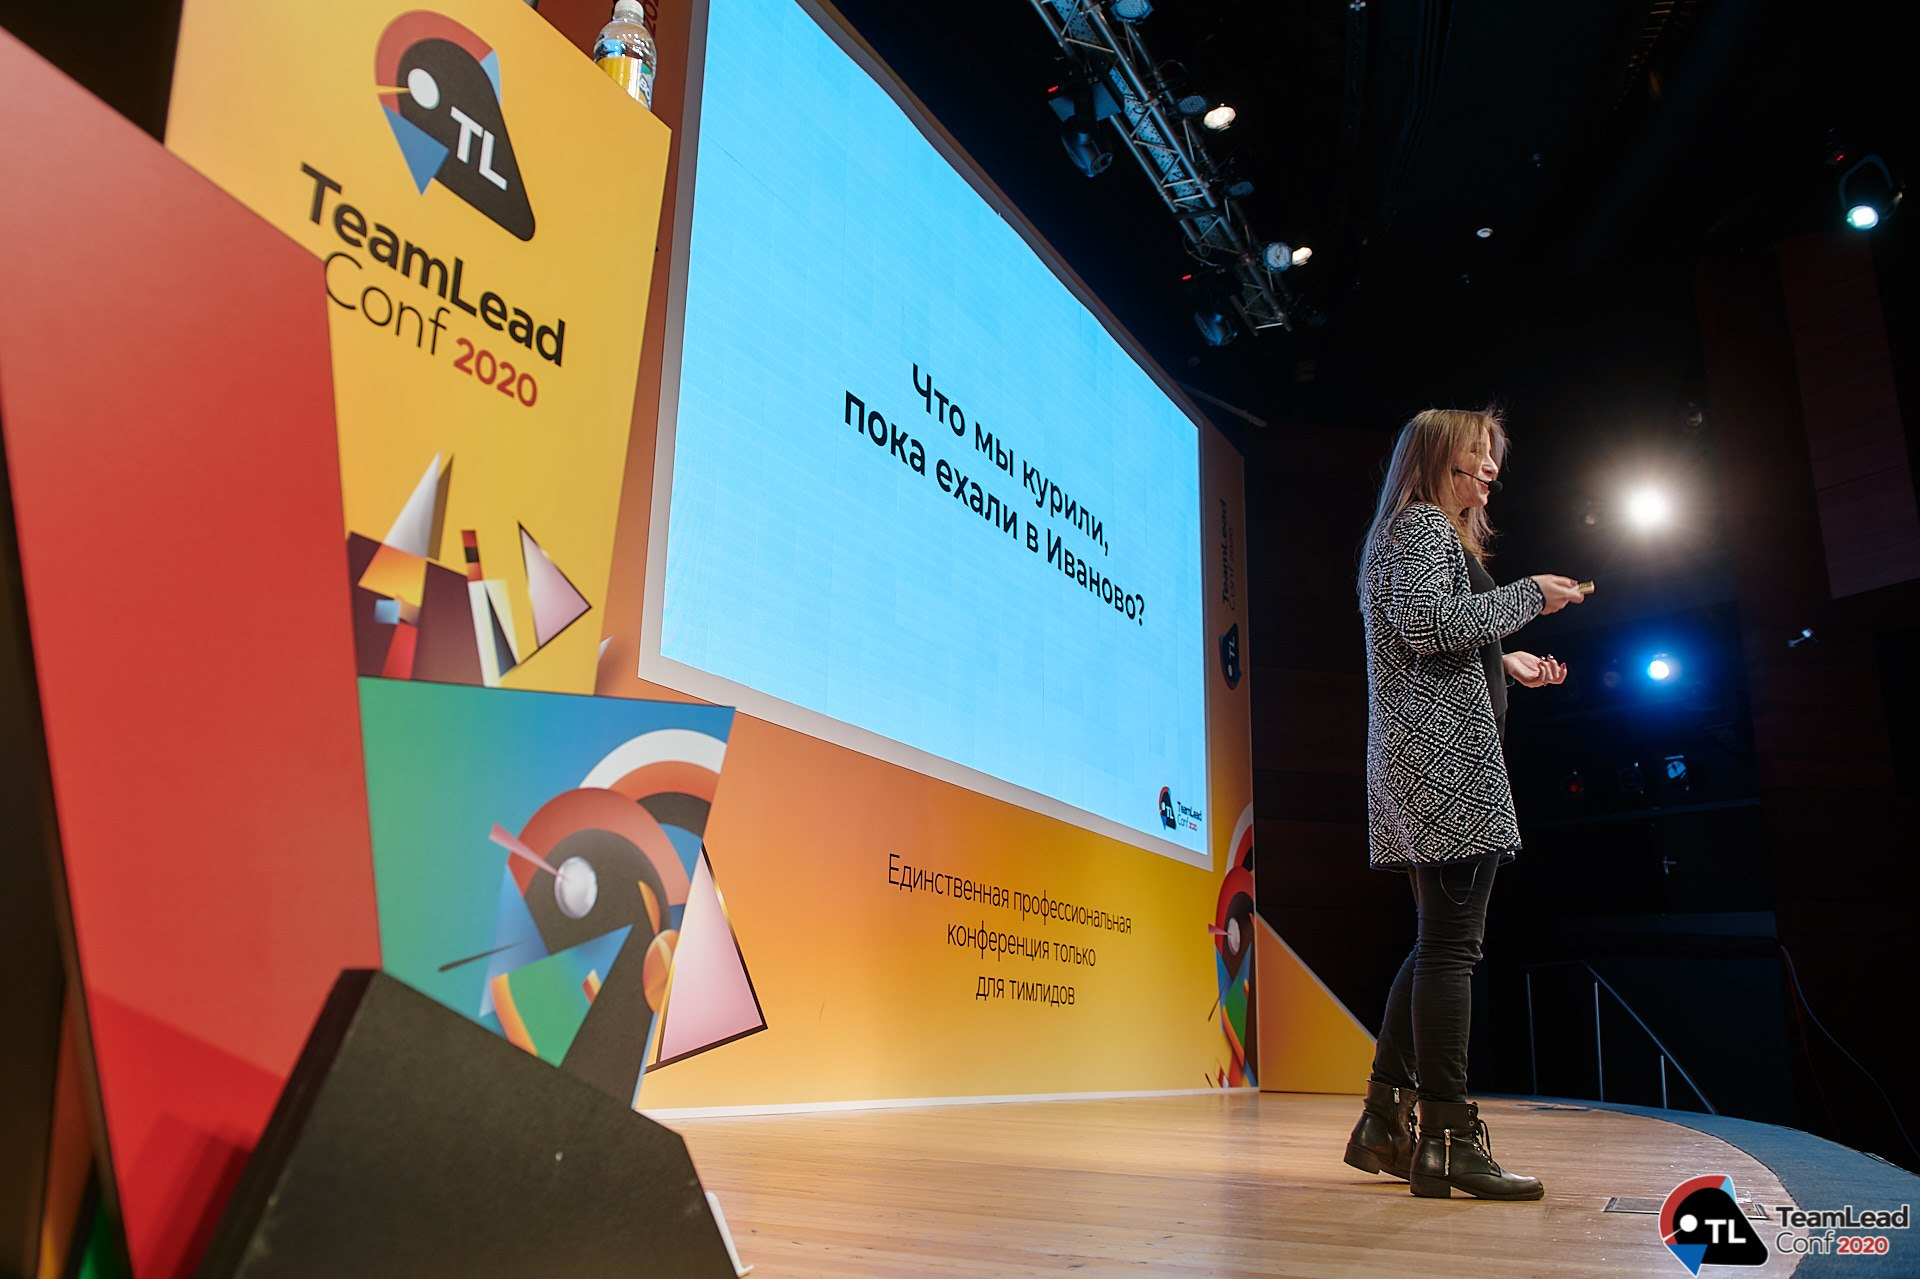 «Больше интерактива!» или Как прошел TeamLead Conf 2020 - 8